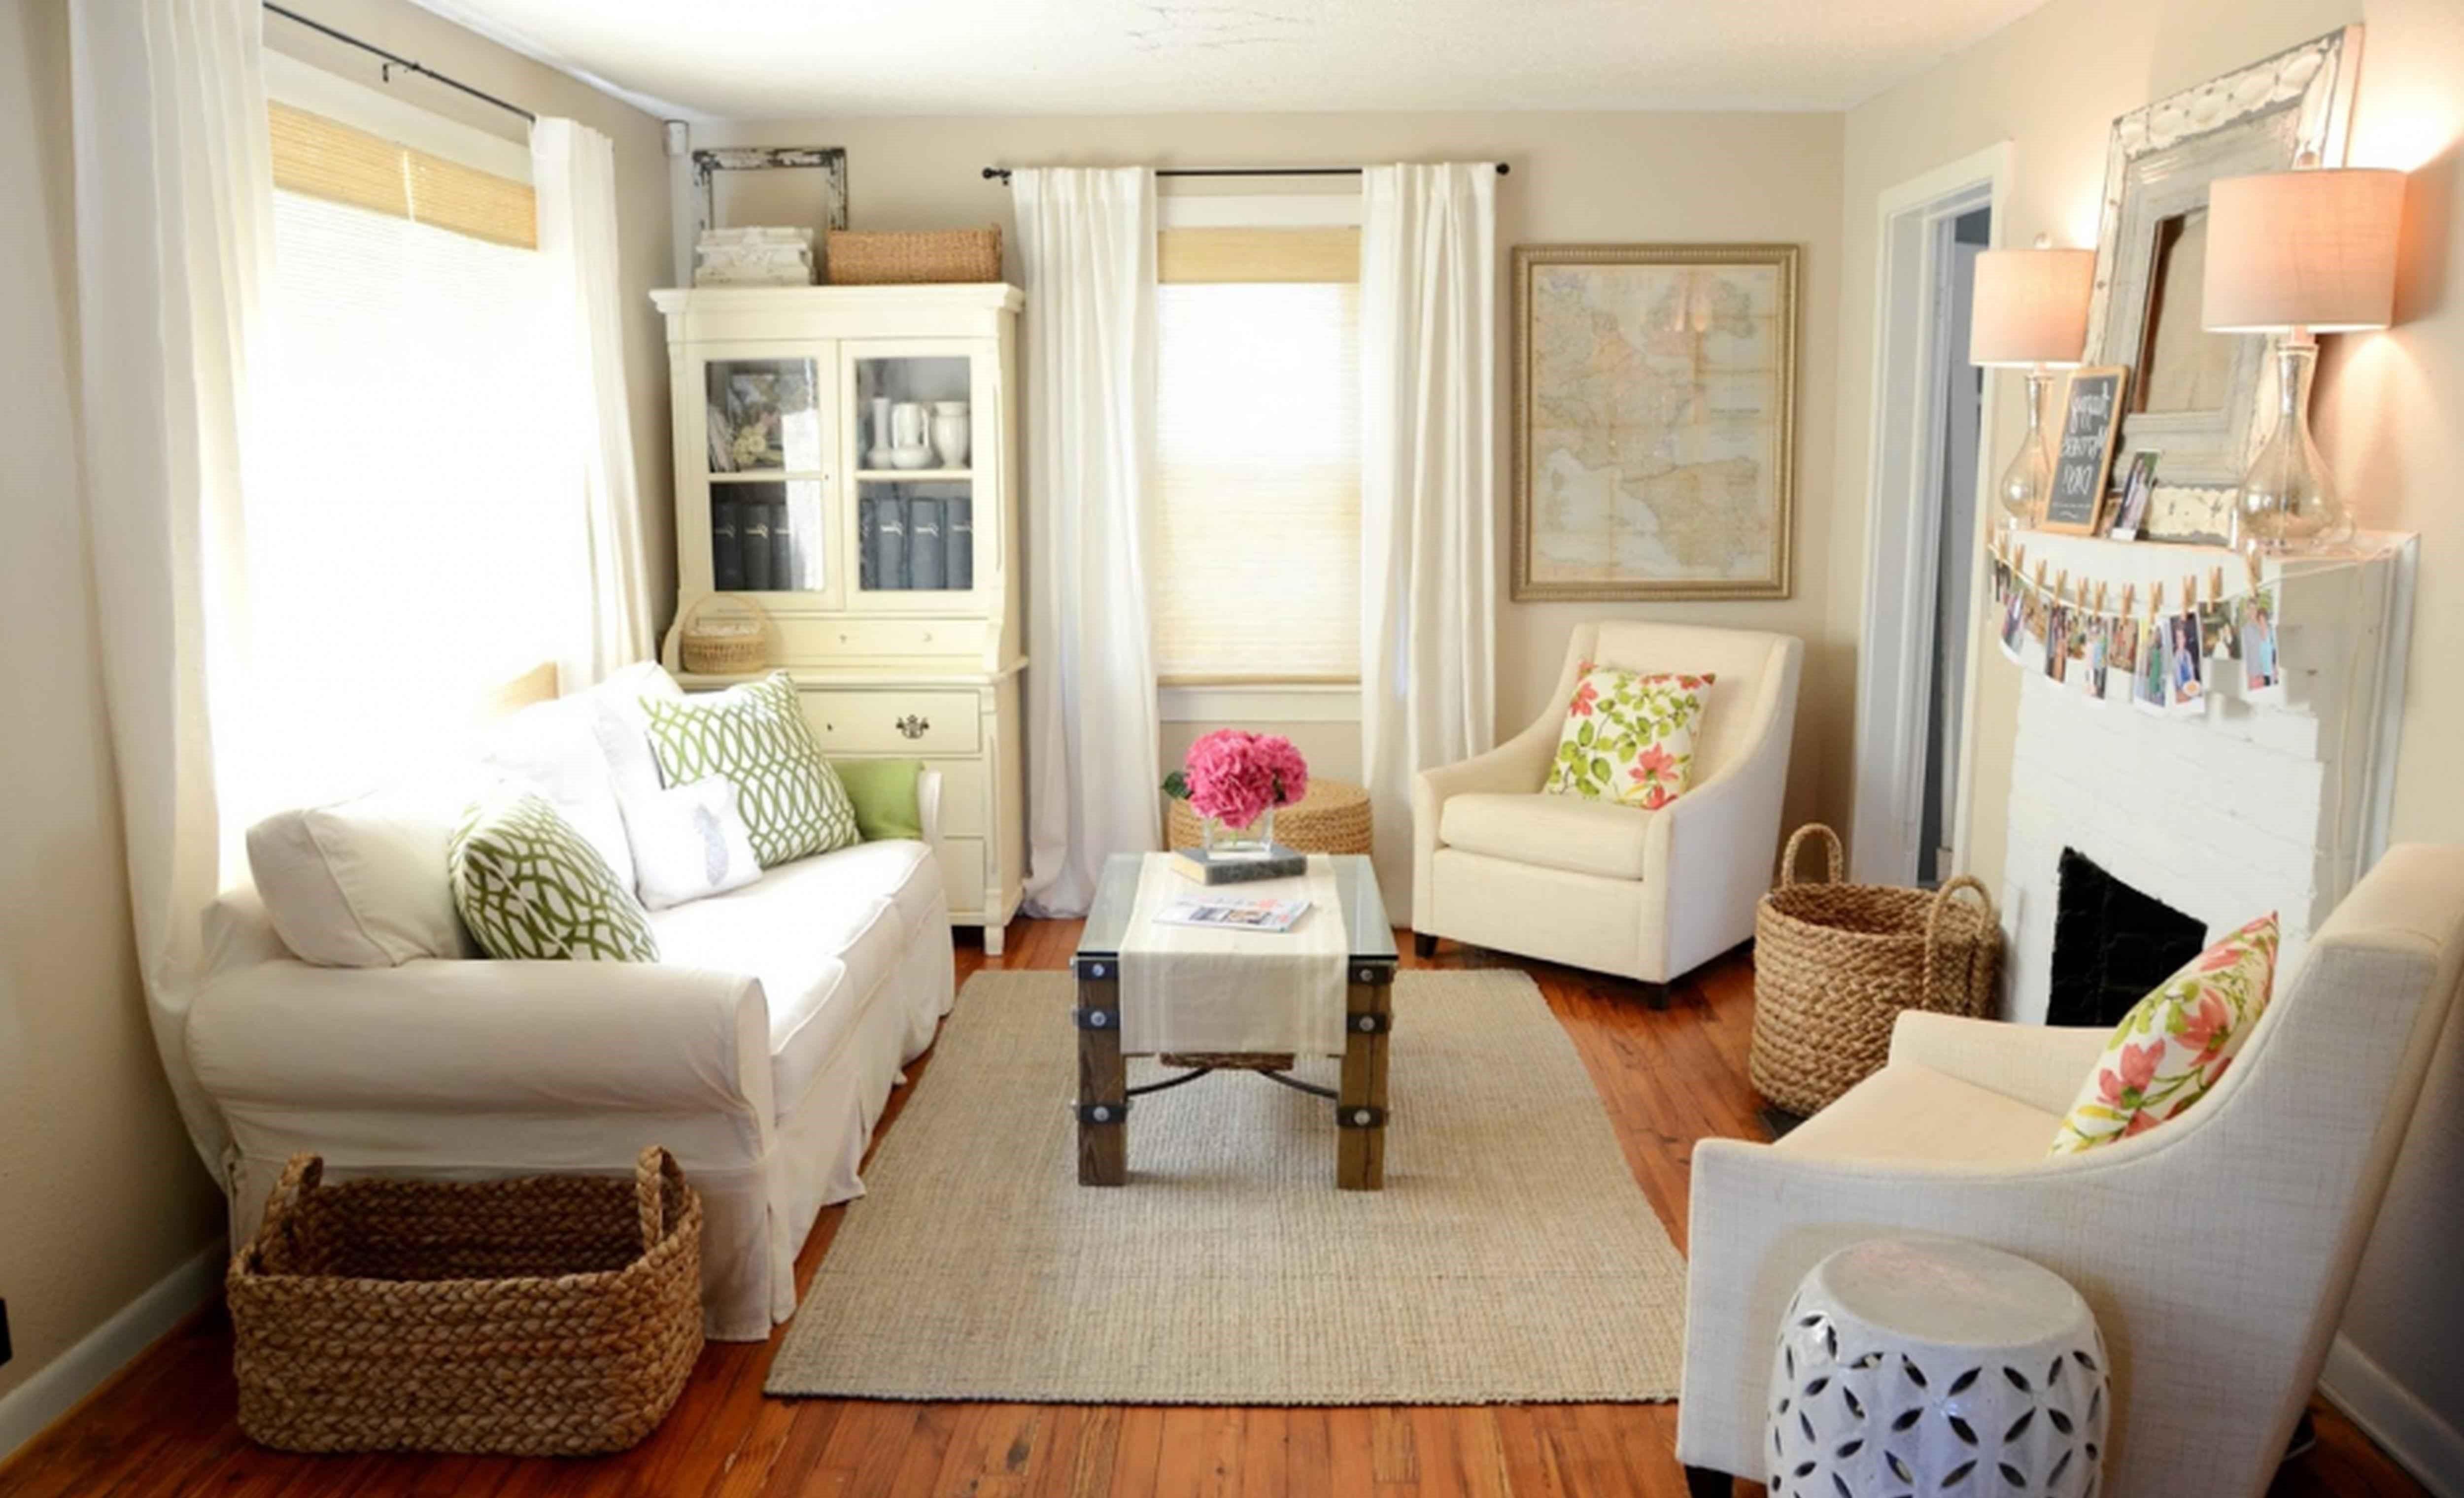 The 10 cardinal sins of Toronto apartment decor that thou ... on Living Room Decor  id=79624